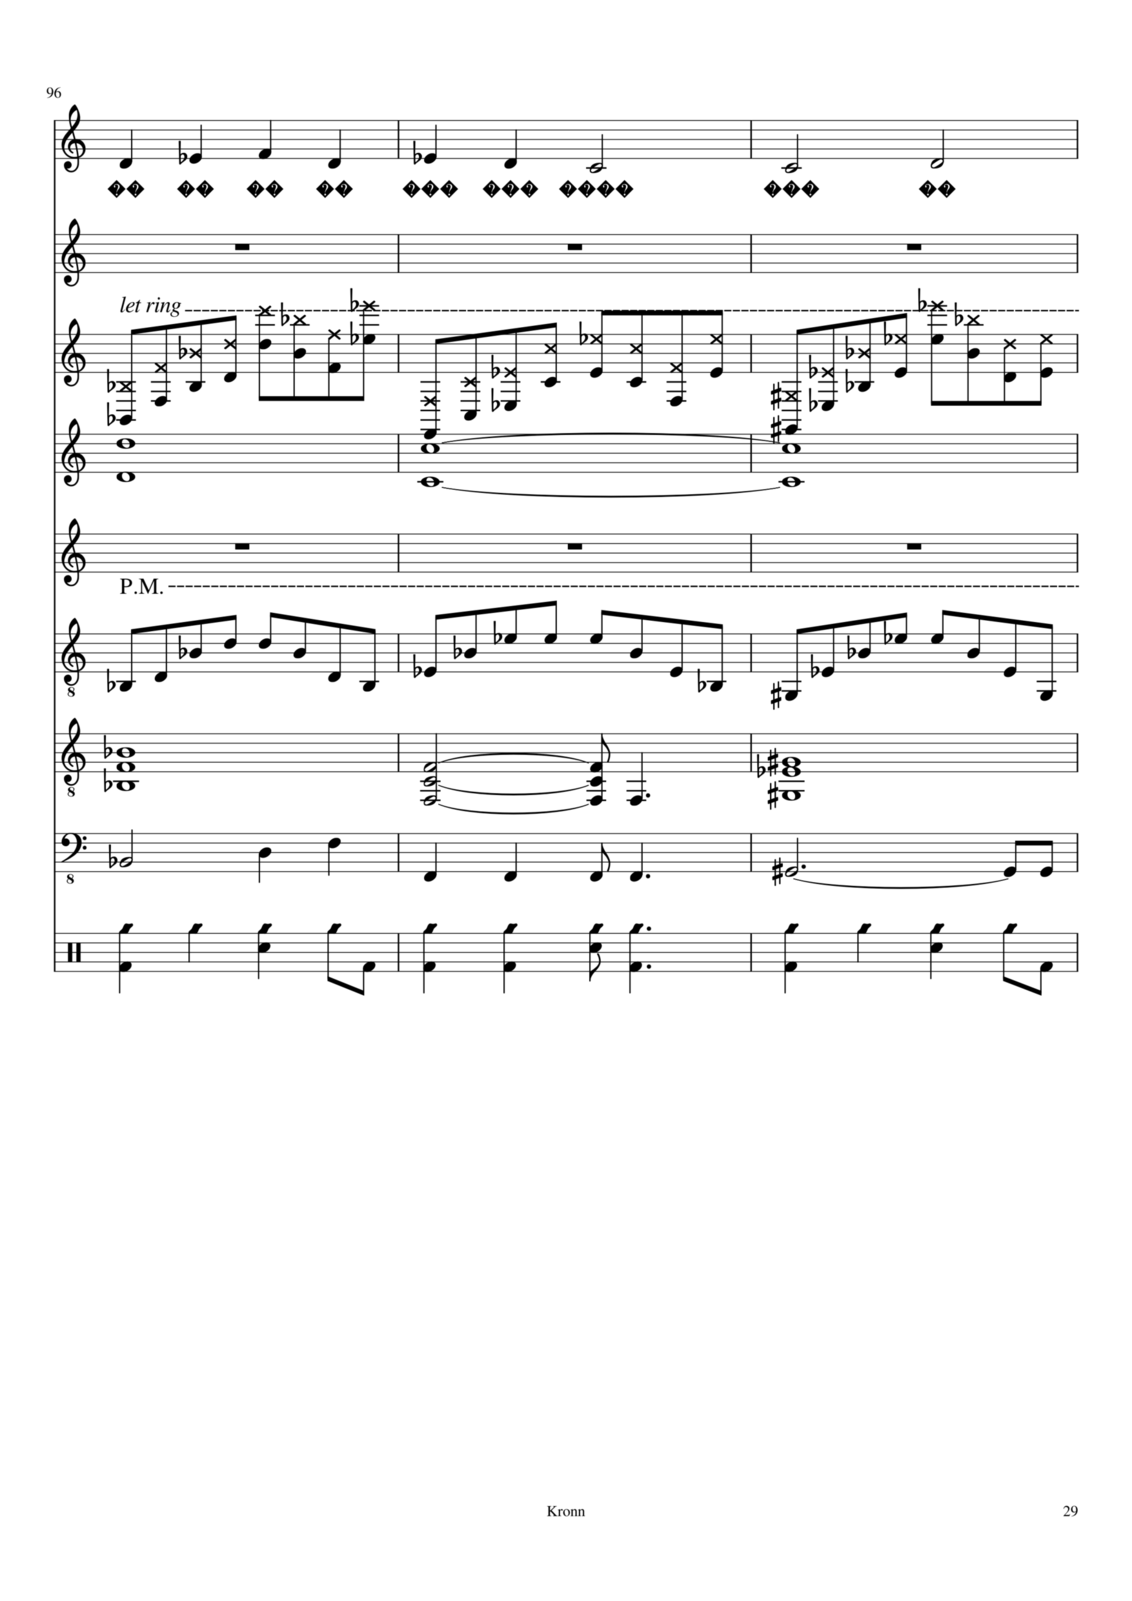 Okean Pustotyi slide, Image 29